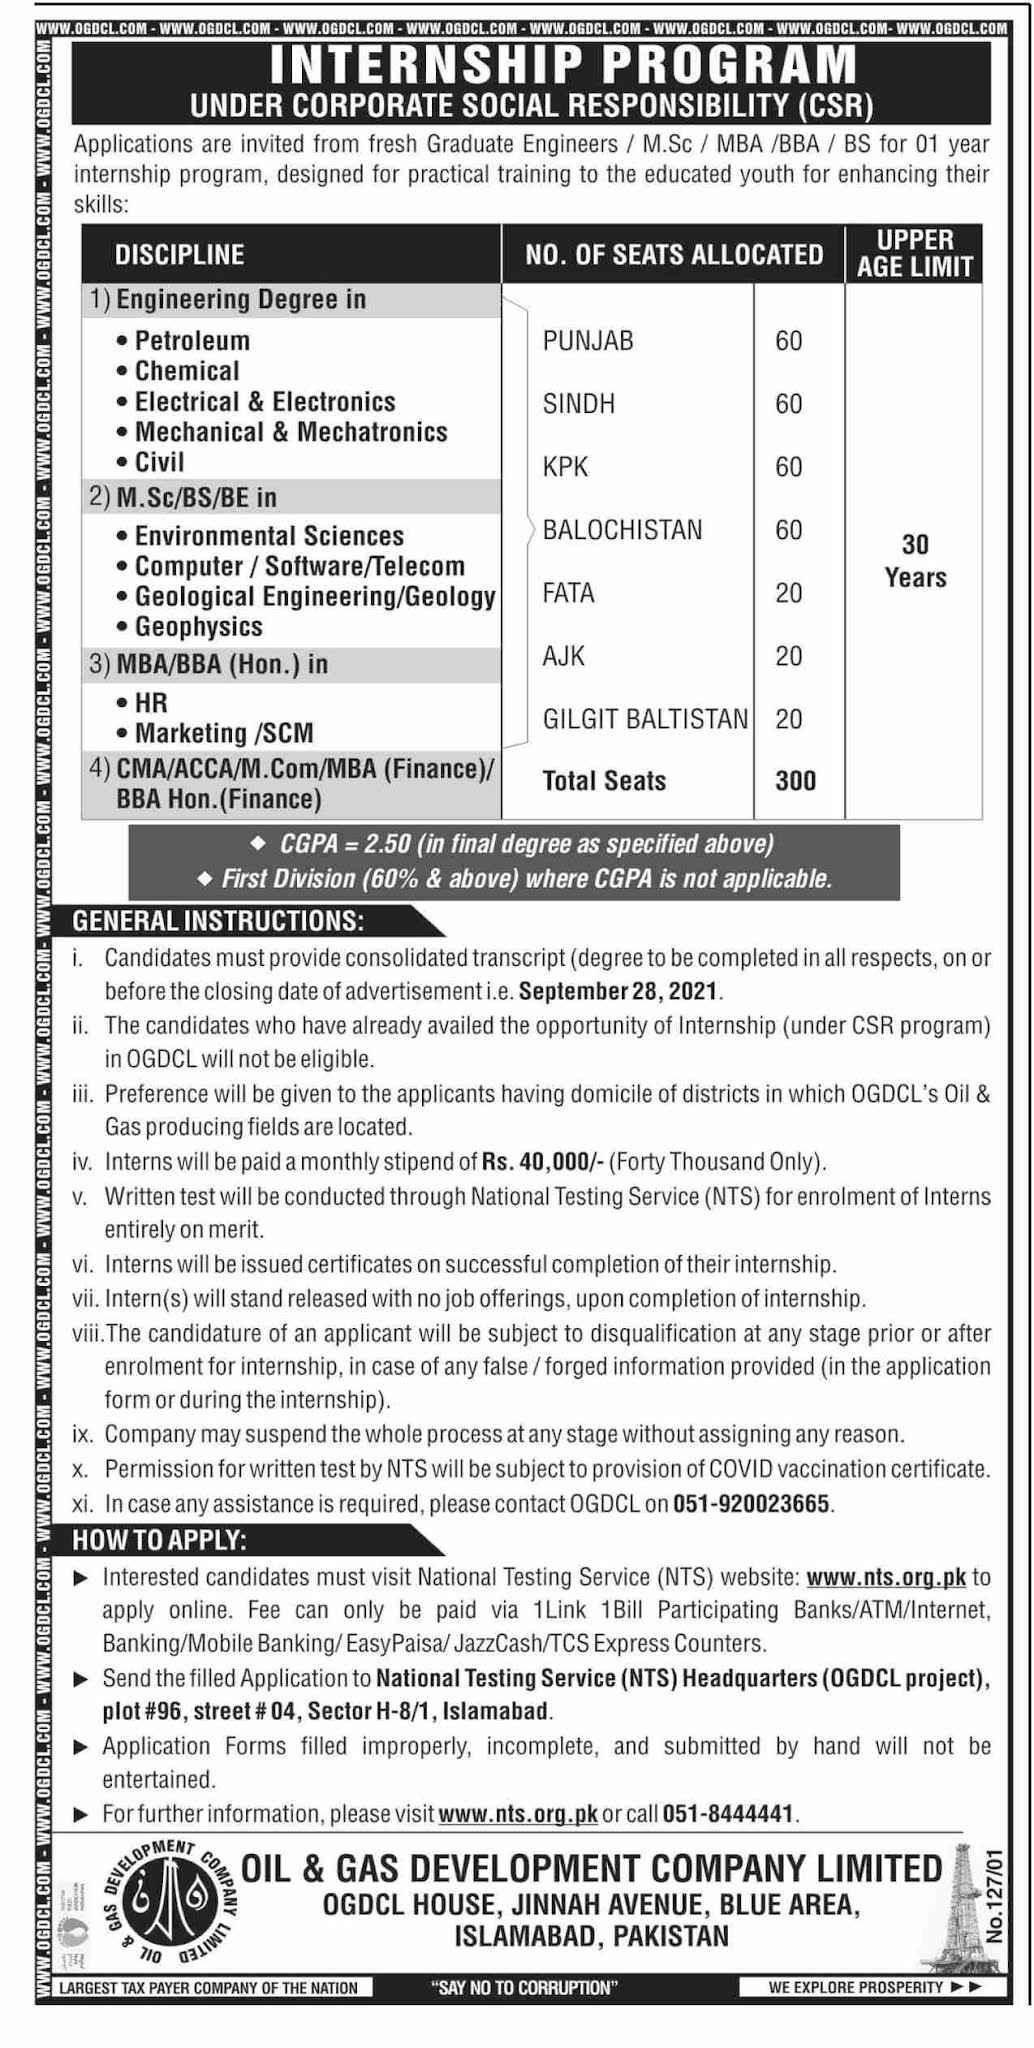 Oil & Gas Development Company Limited OGDCL Internship Program 2021